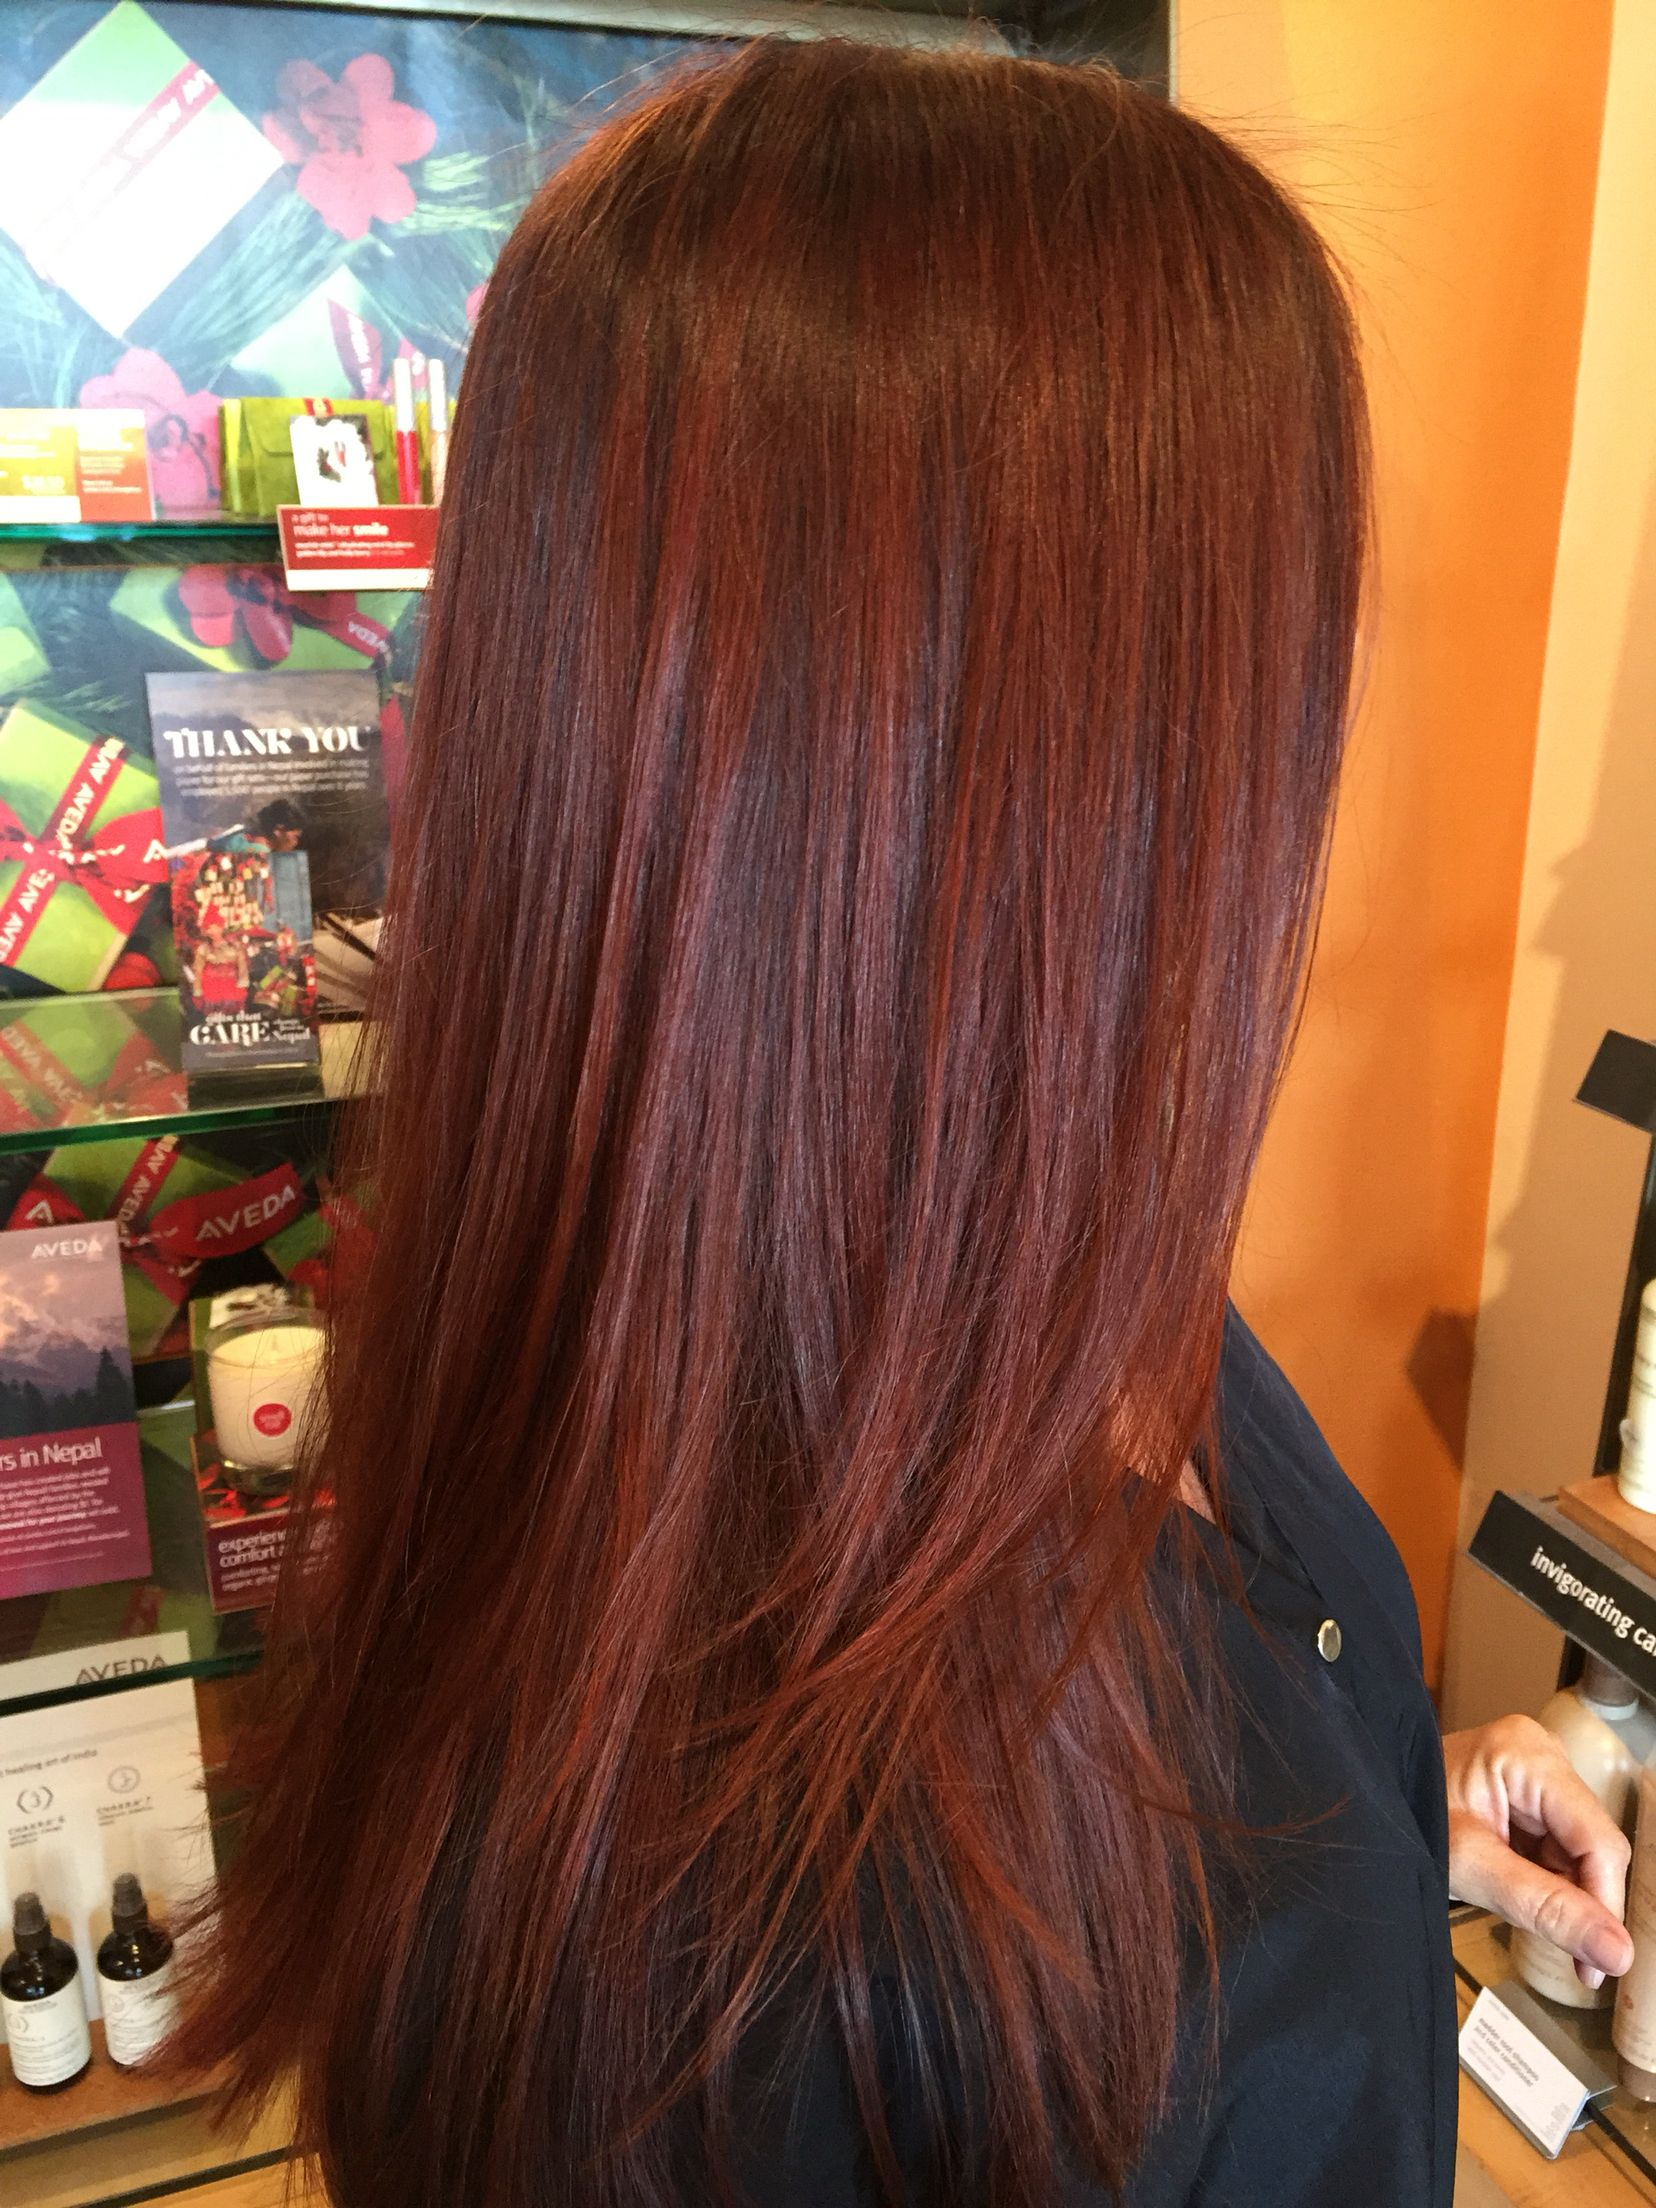 Deep Red Hair Aveda Color Aveda Color Aveda Hair